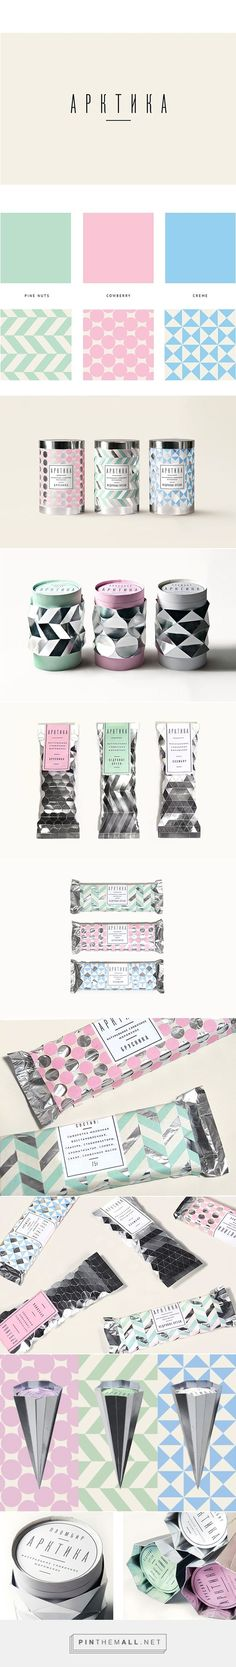 Arktika Ice Cream Packaging by Natasha Chuvinova on Behance | Fivestar Branding – Design and Branding Agency & Inspiration Gallery